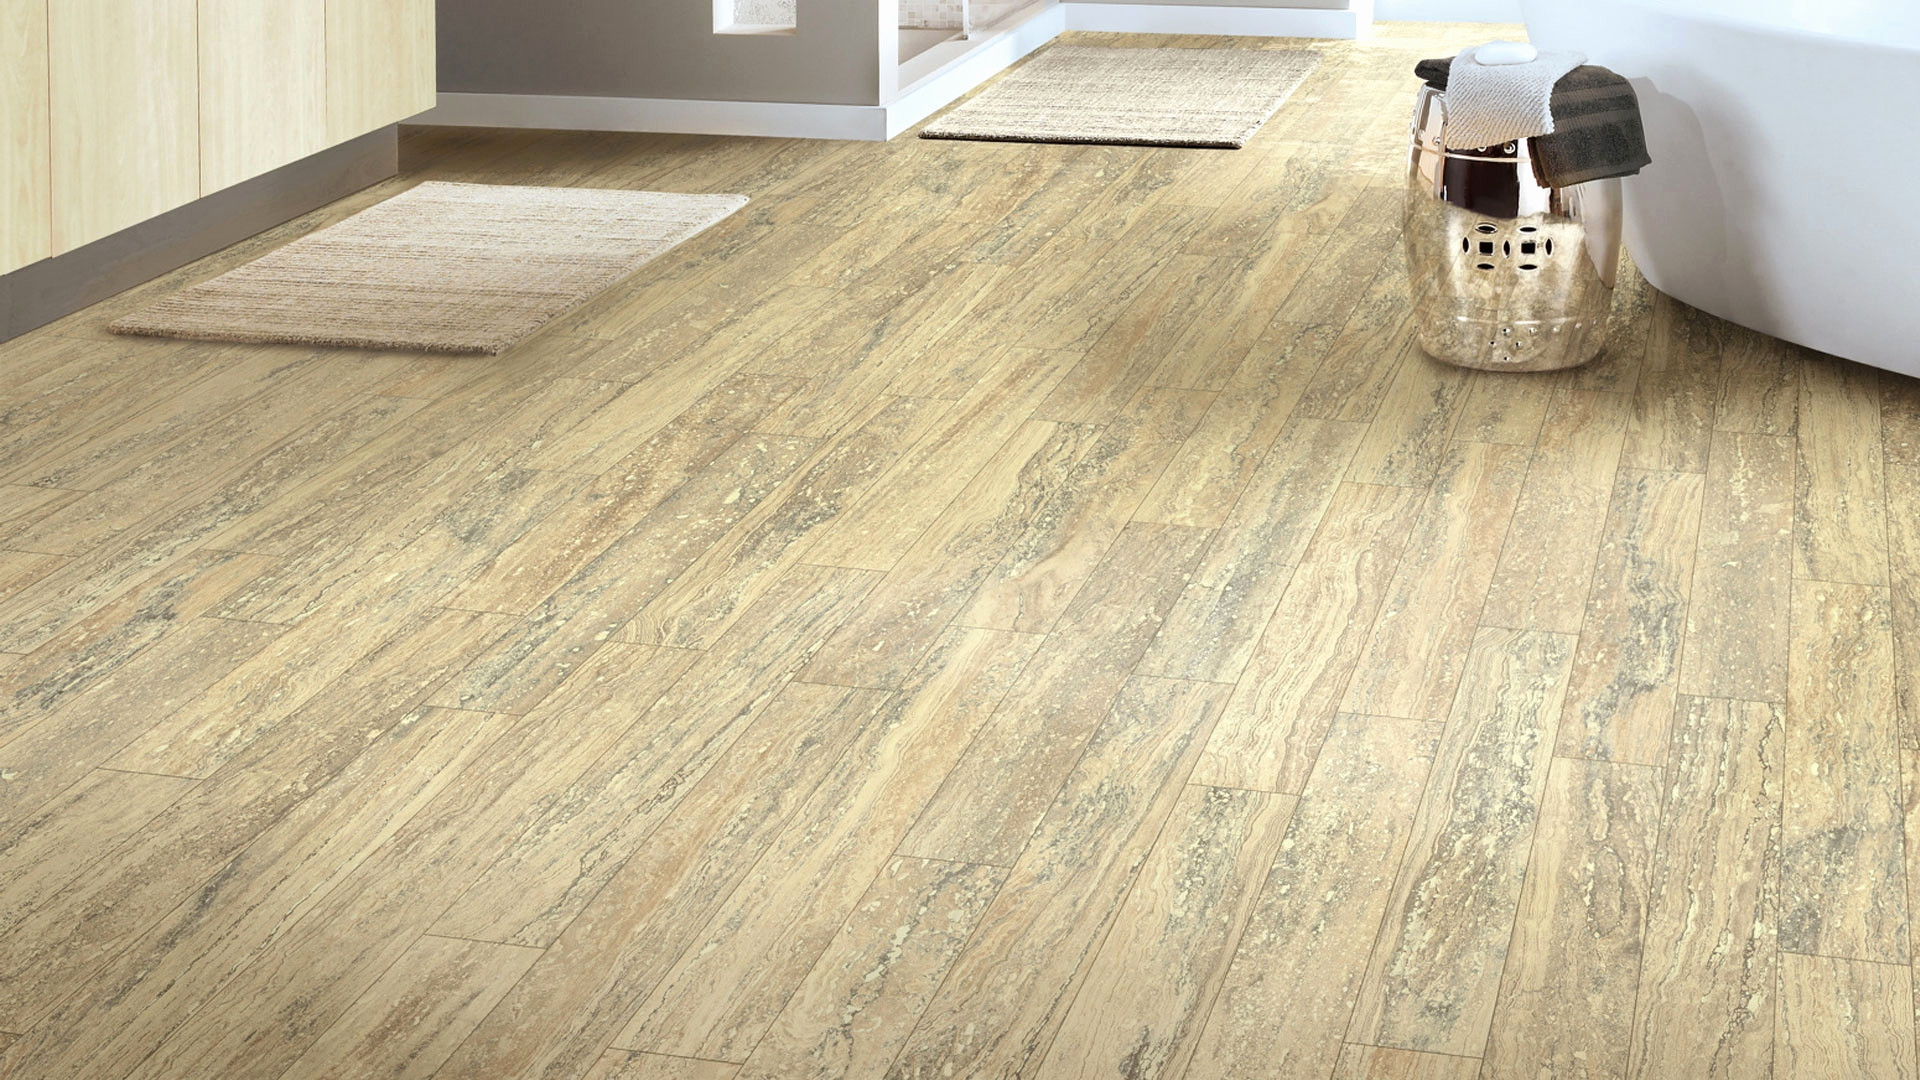 hardwood flooring cost of extraordinary bathroom wood floor at hardwood floor estimate inside extraordinary bathroom wood floor at hardwood floor estimate